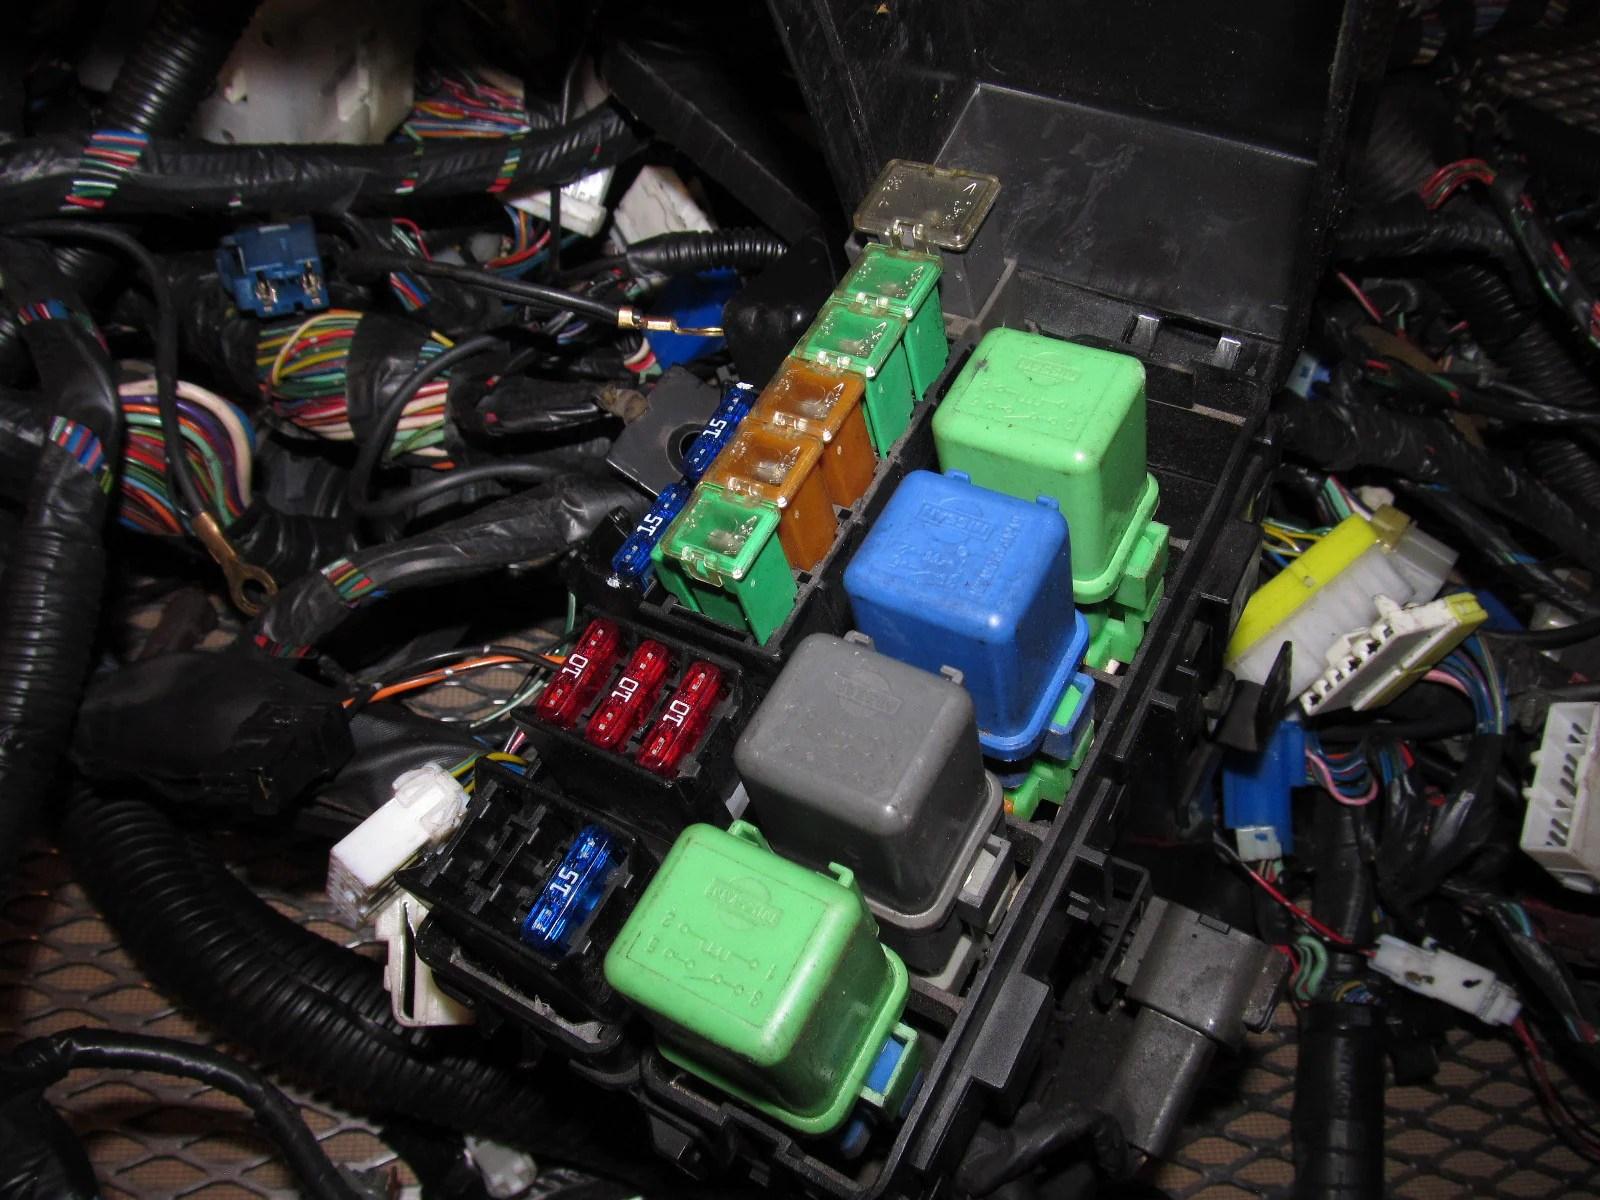 nissan 97 240sx fuse box wiring diagram technic 1996 nissan 240sx fuse box [ 1600 x 1200 Pixel ]